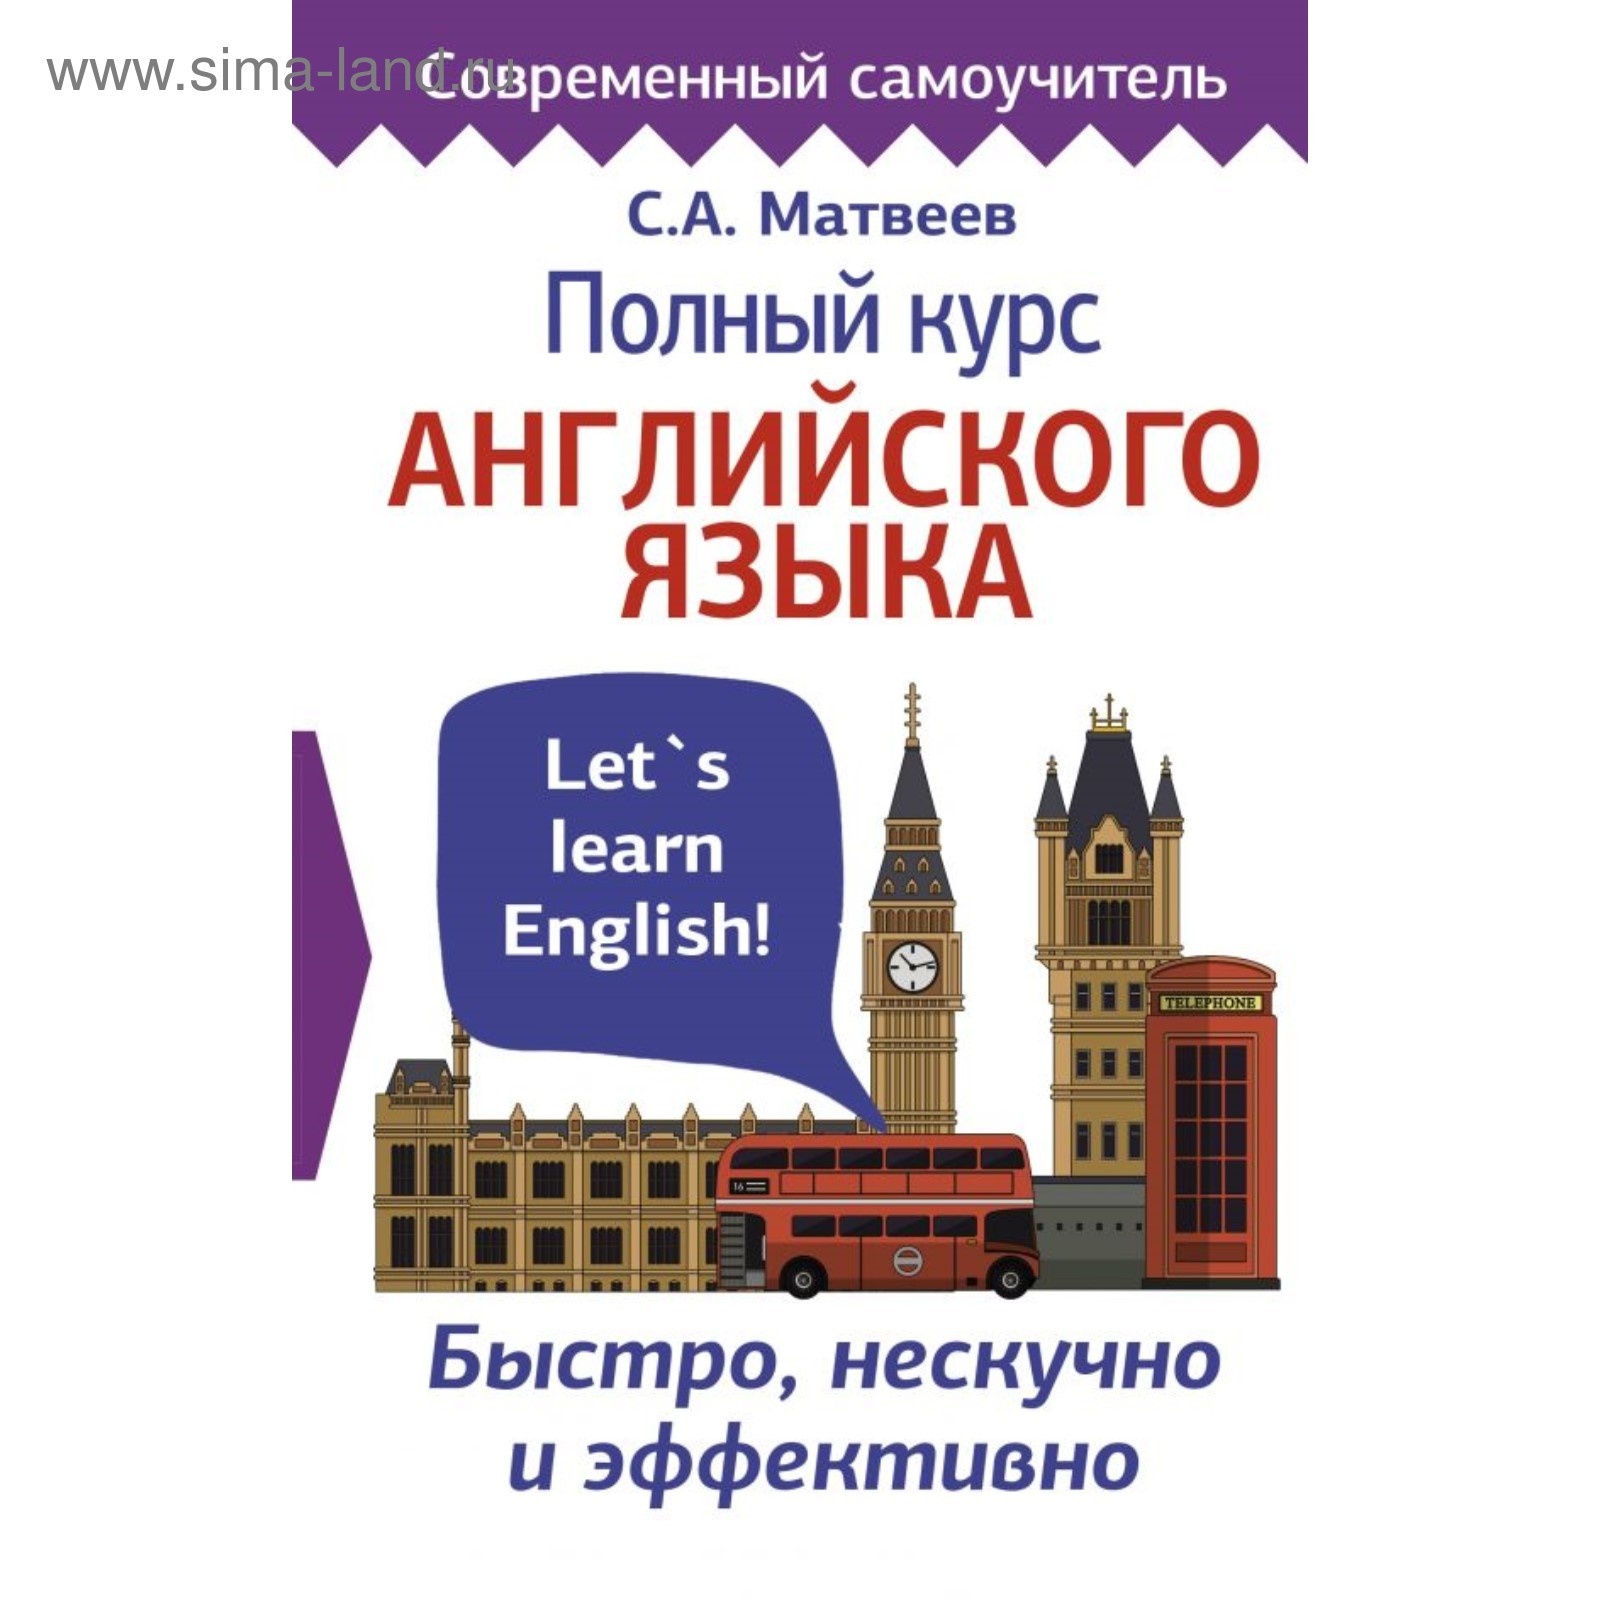 Матвеев Андрей Картины биография Matveev Andrey | 1600x1600